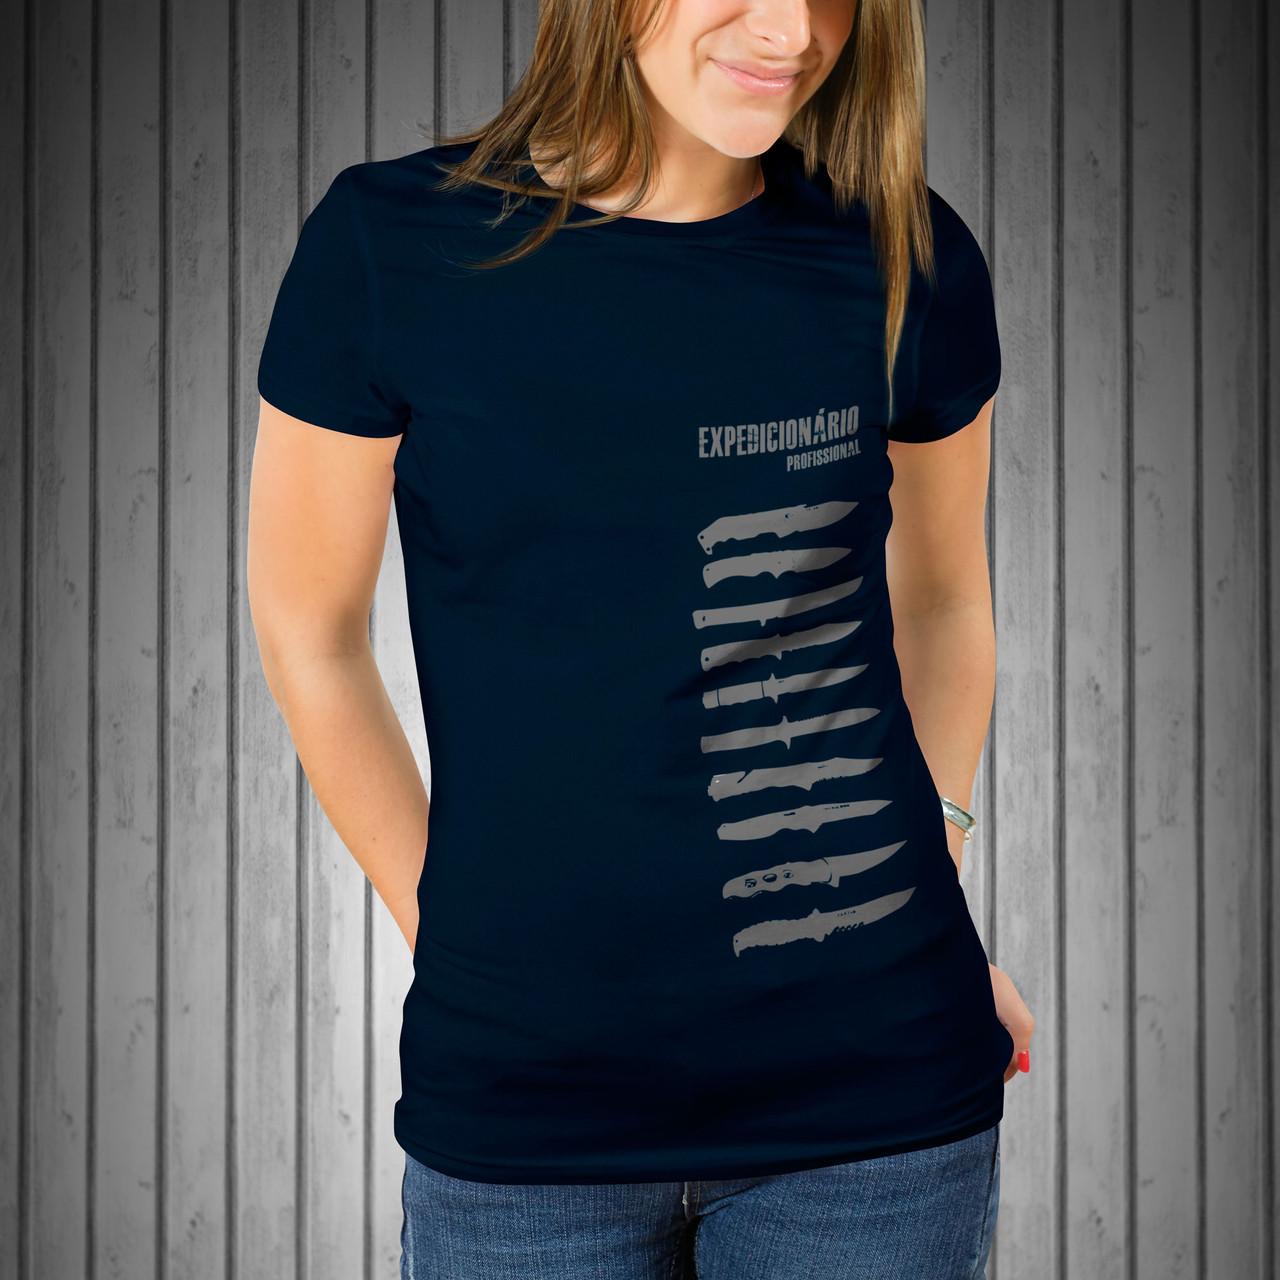 Female-Tshirt-Mockup-Front2 (1)